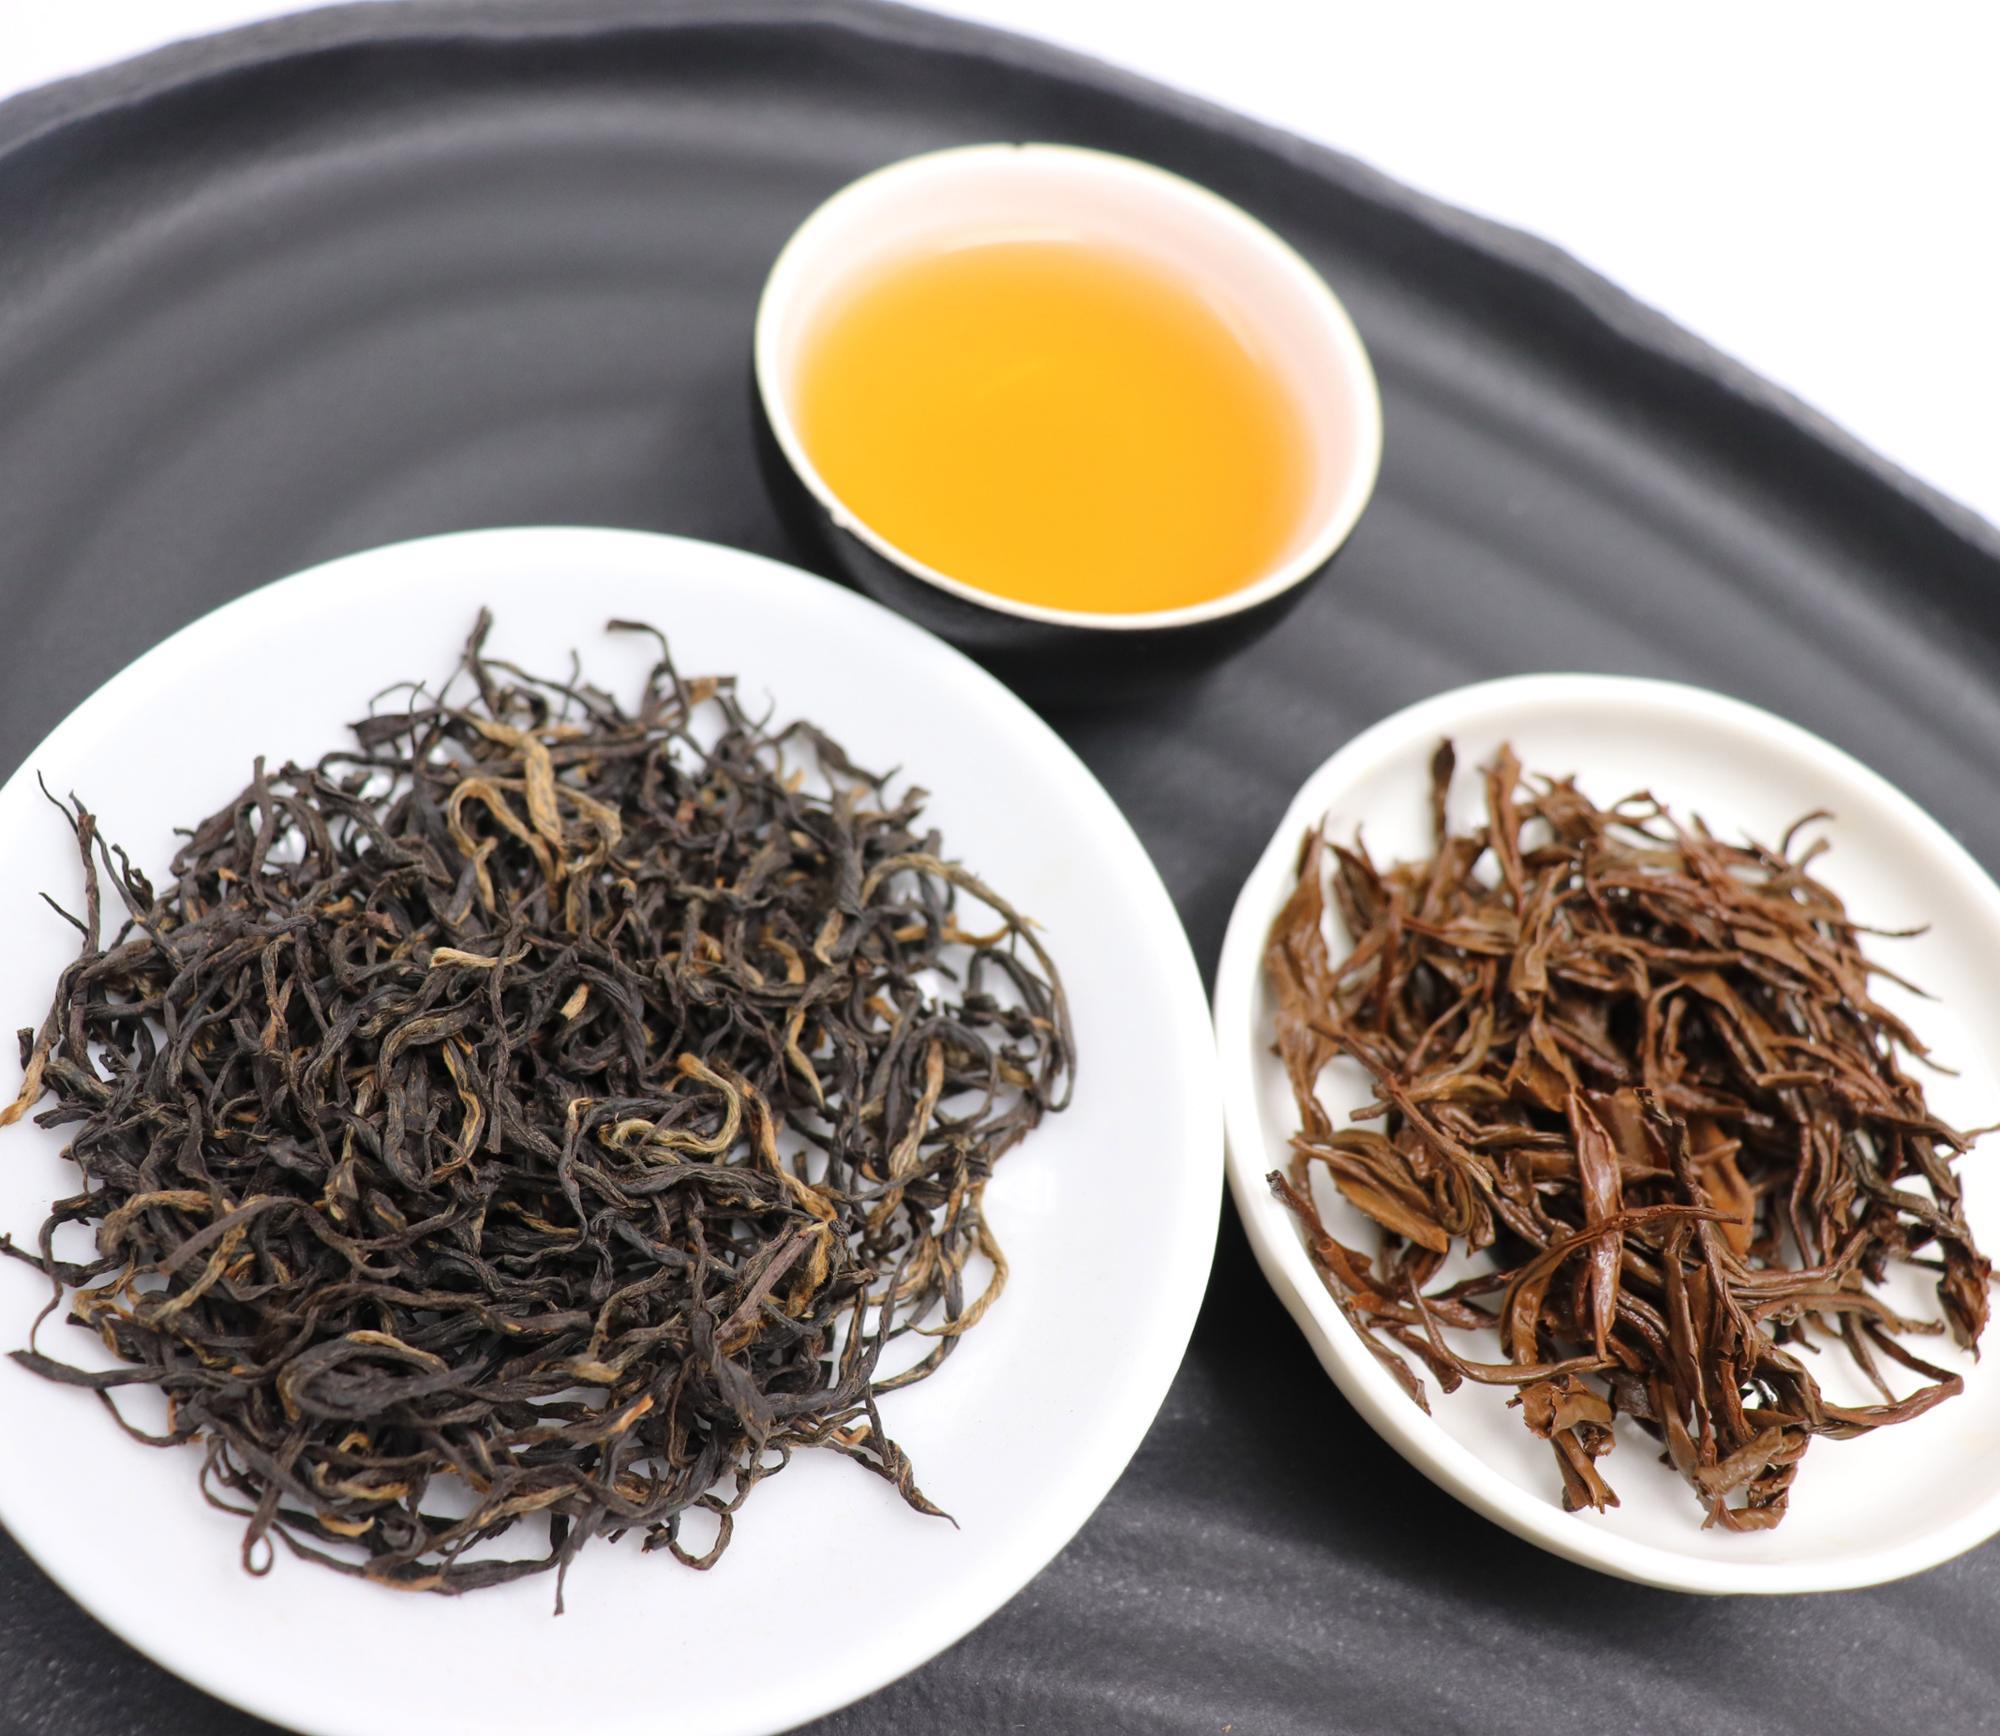 Full Fermented Golden Organic Jin Jun Mei Black Tea Slimming black tea - 4uTea | 4uTea.com